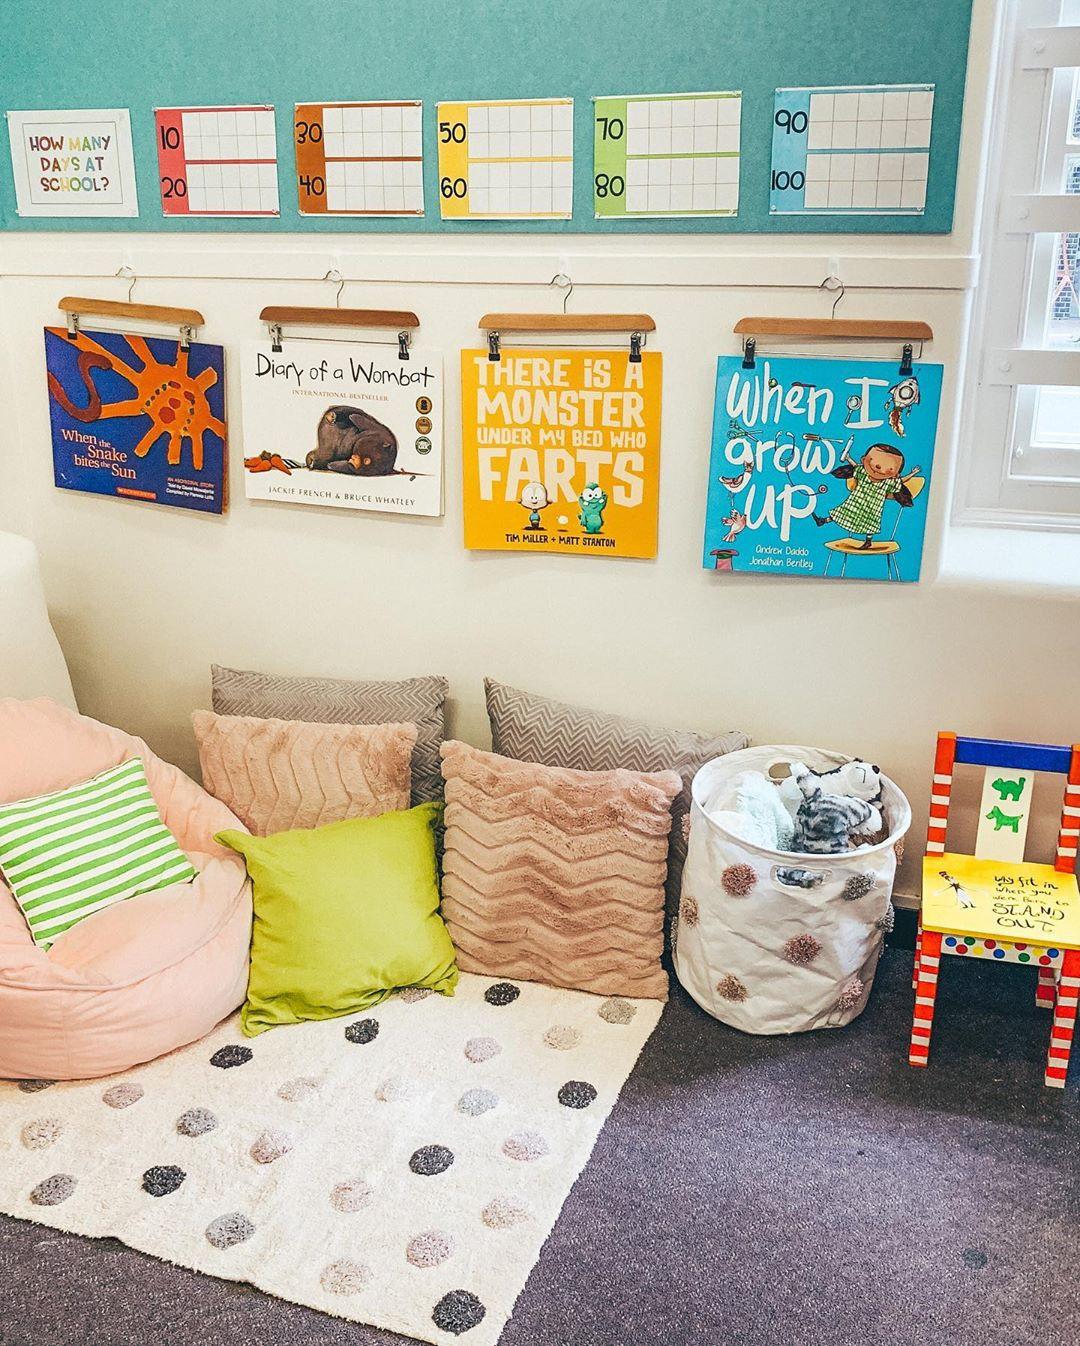 35 Ideas for Creative Reading Corner for Kids,children's reading corner furniture,reading corner ideas for kindergarten,reading corner ideas for home